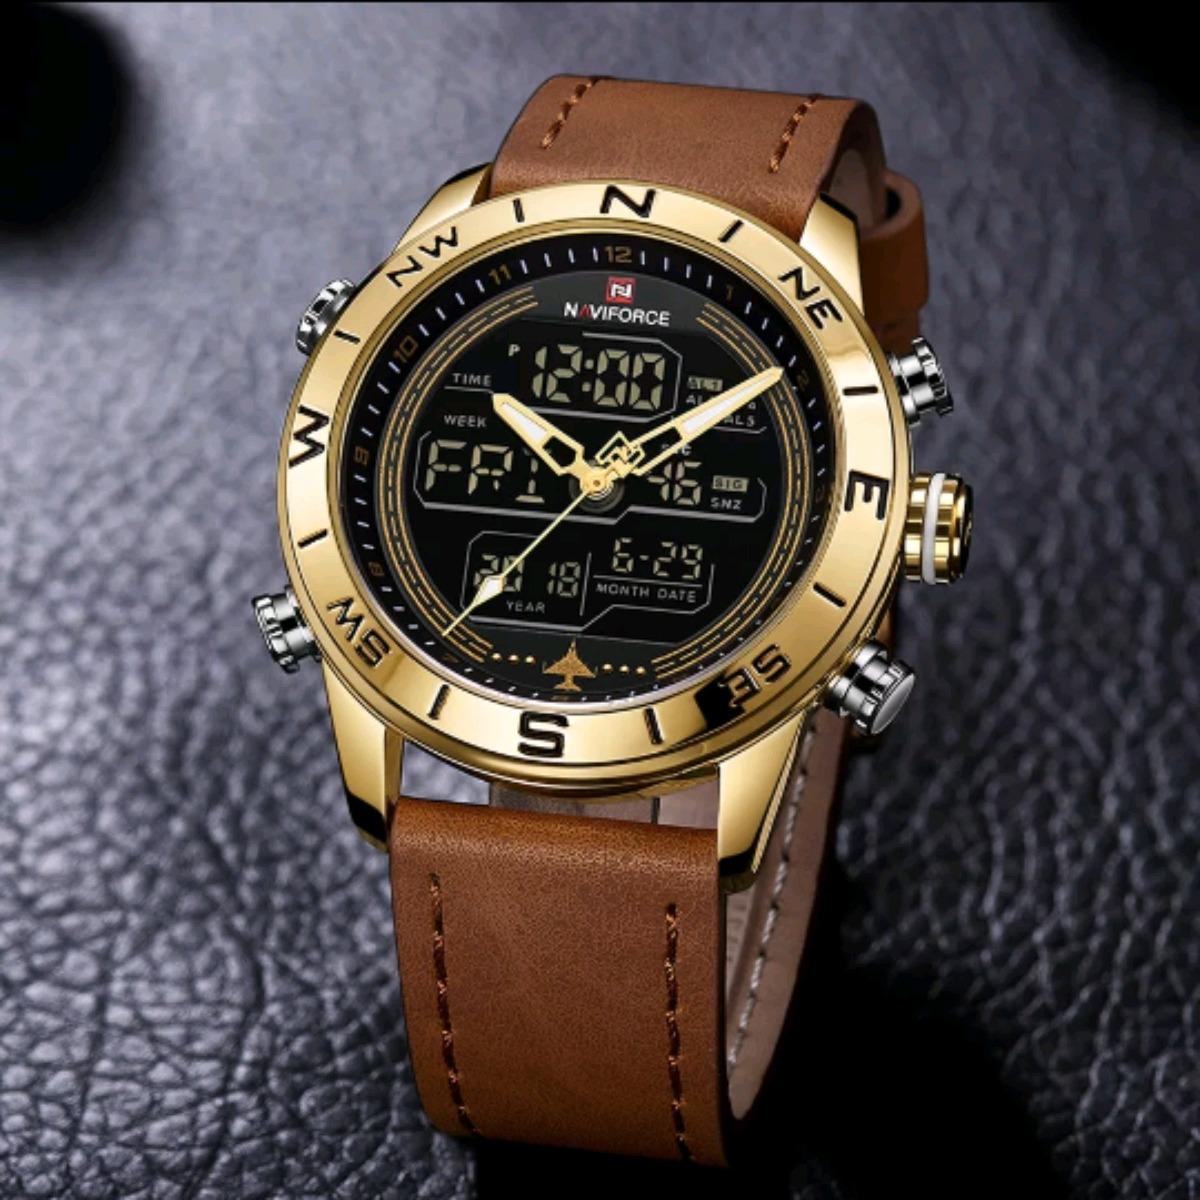 6b13f6e3785 relogio masculino dourado digital barato a pronta entrega. Carregando zoom.